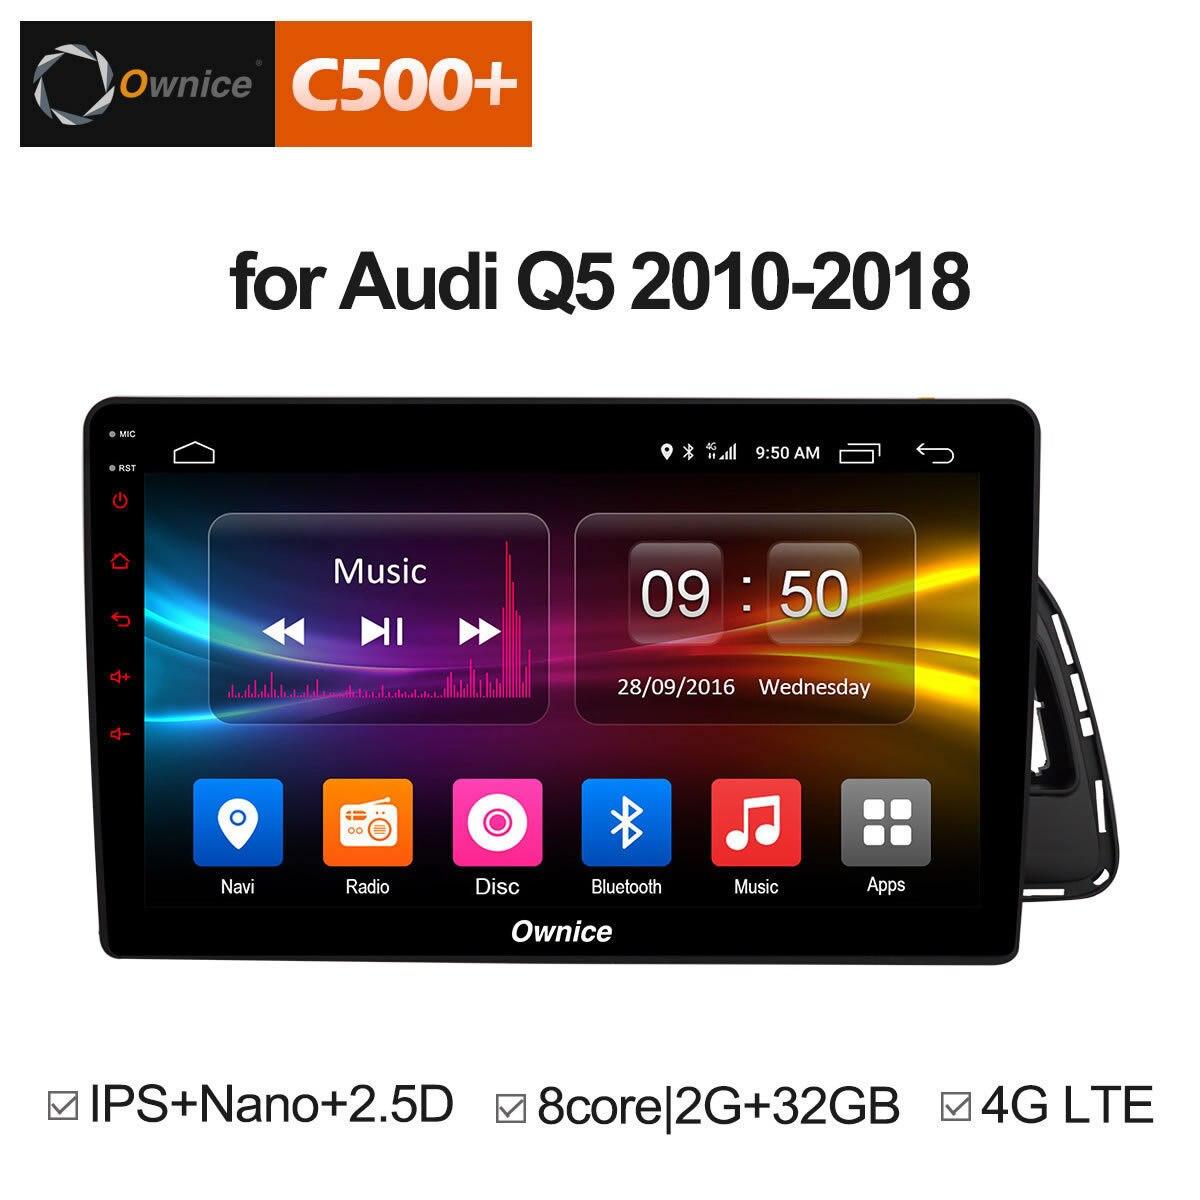 For Audi Q5 2010 2011 2012 2013 2014 2015 2016 2017 2018